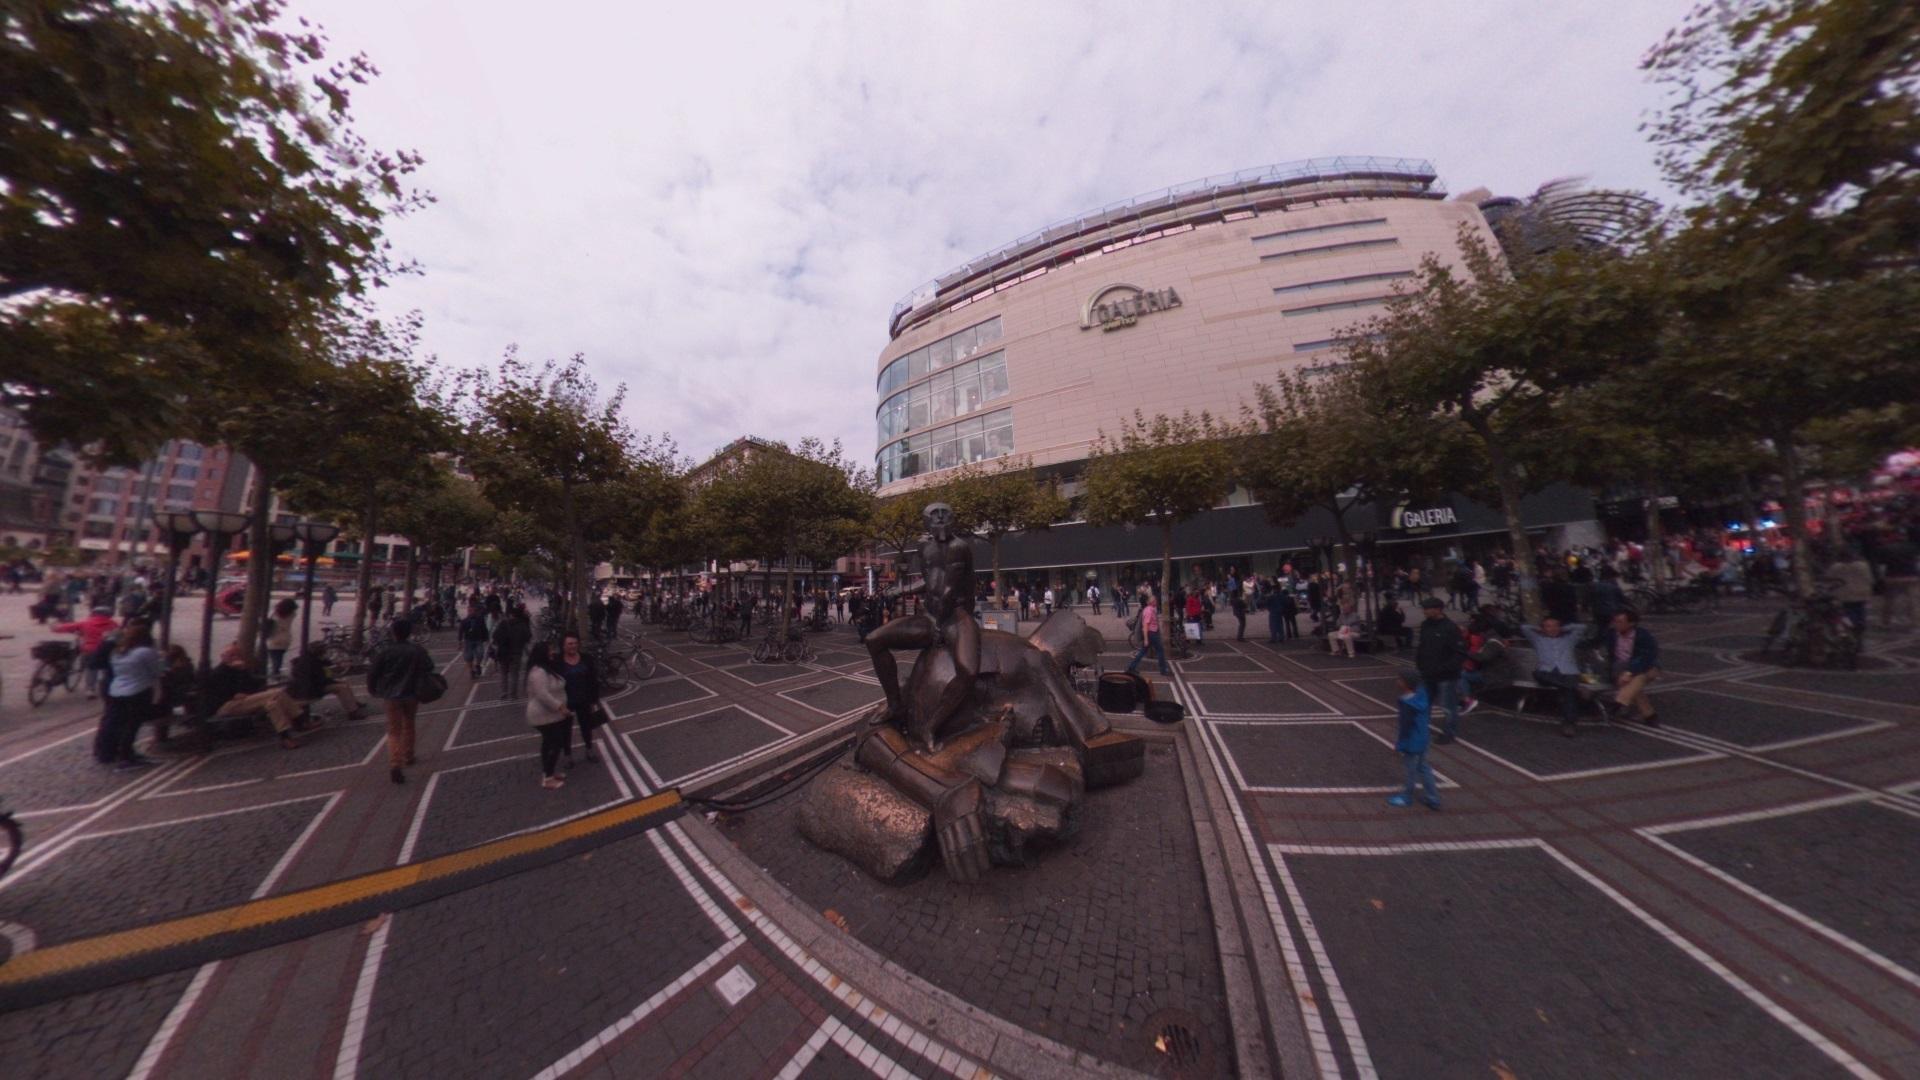 Fotos 360 Estatua curiosa de Frankfurt. #VidePan por #Frankfurt